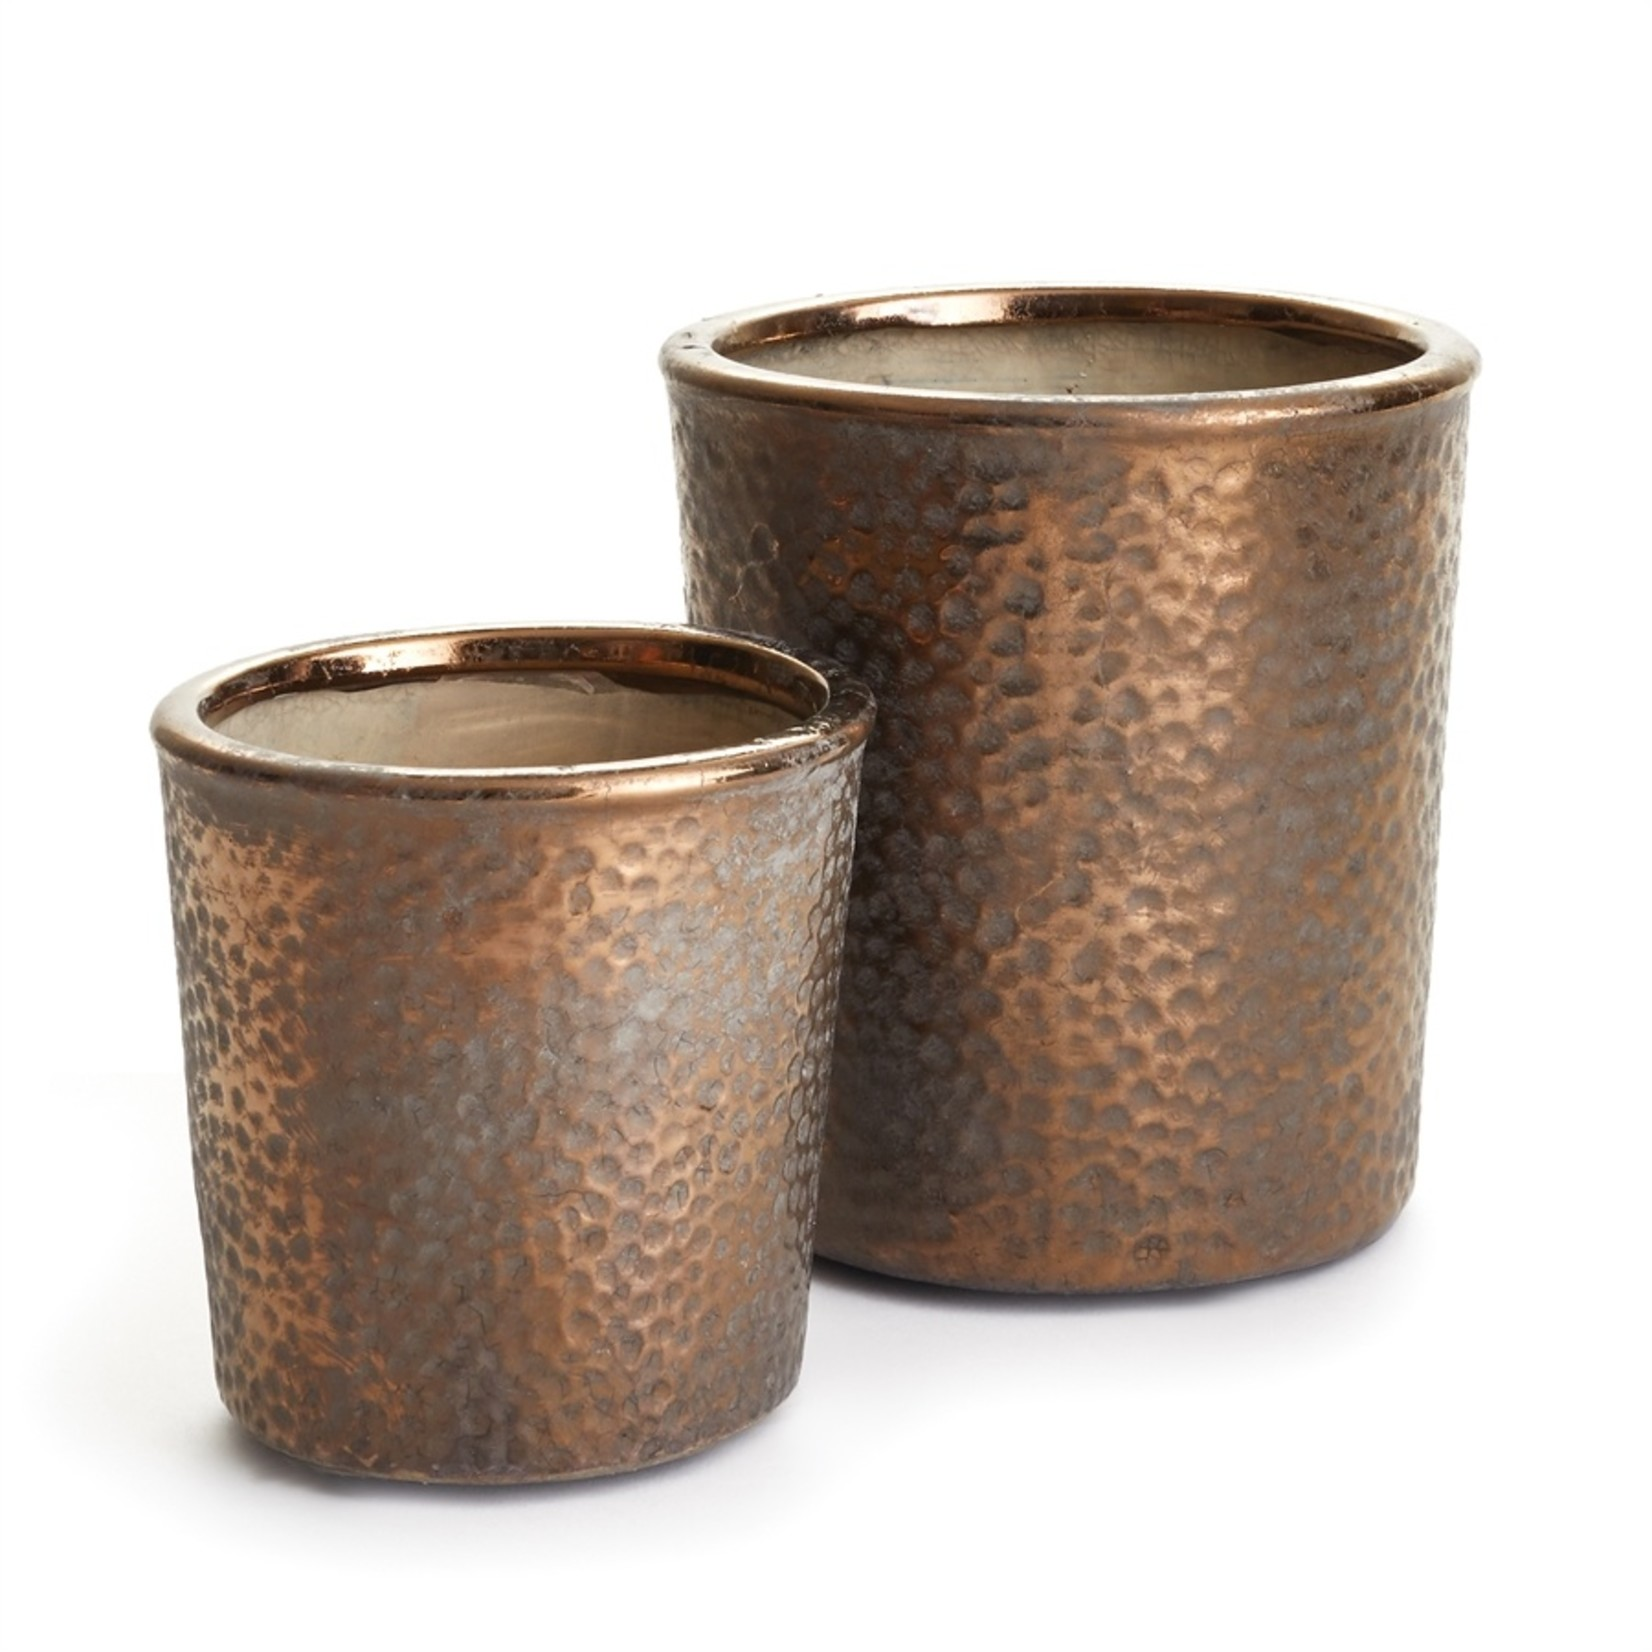 Napa Home and Garden Peyton Tapered Pot